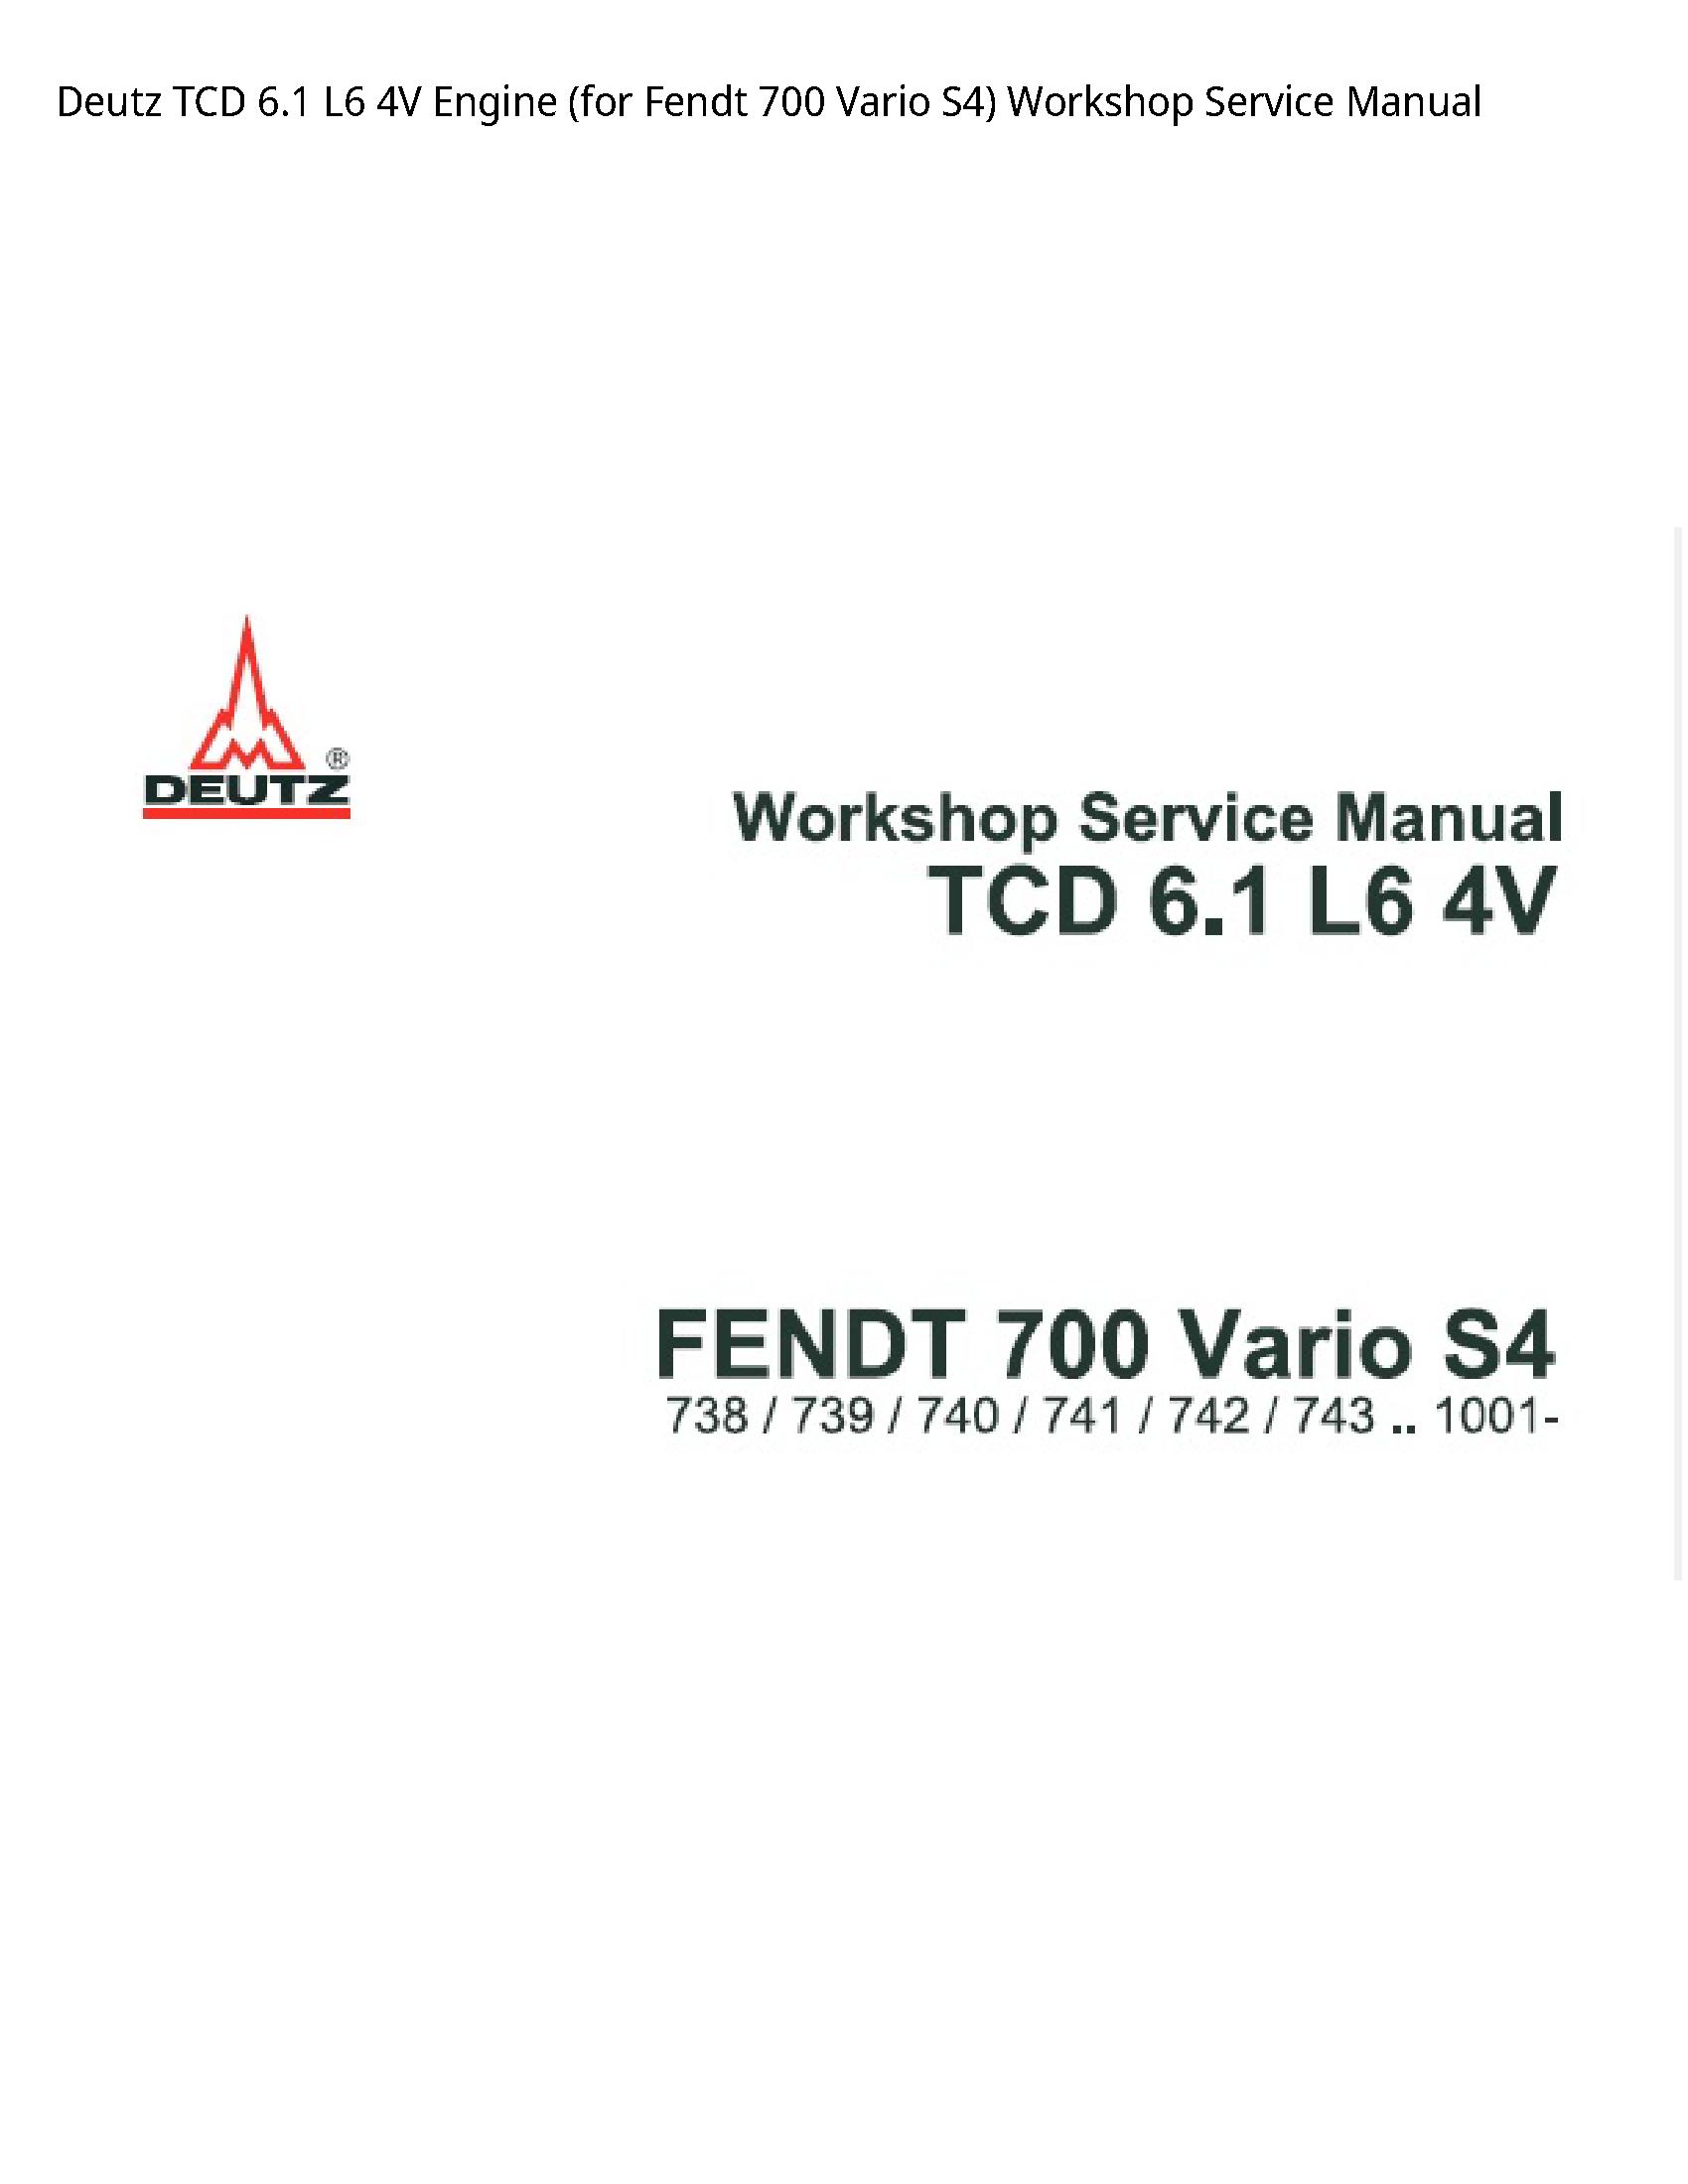 Deutz 6.1 TCD Engine (for Fendt Vario Service manual